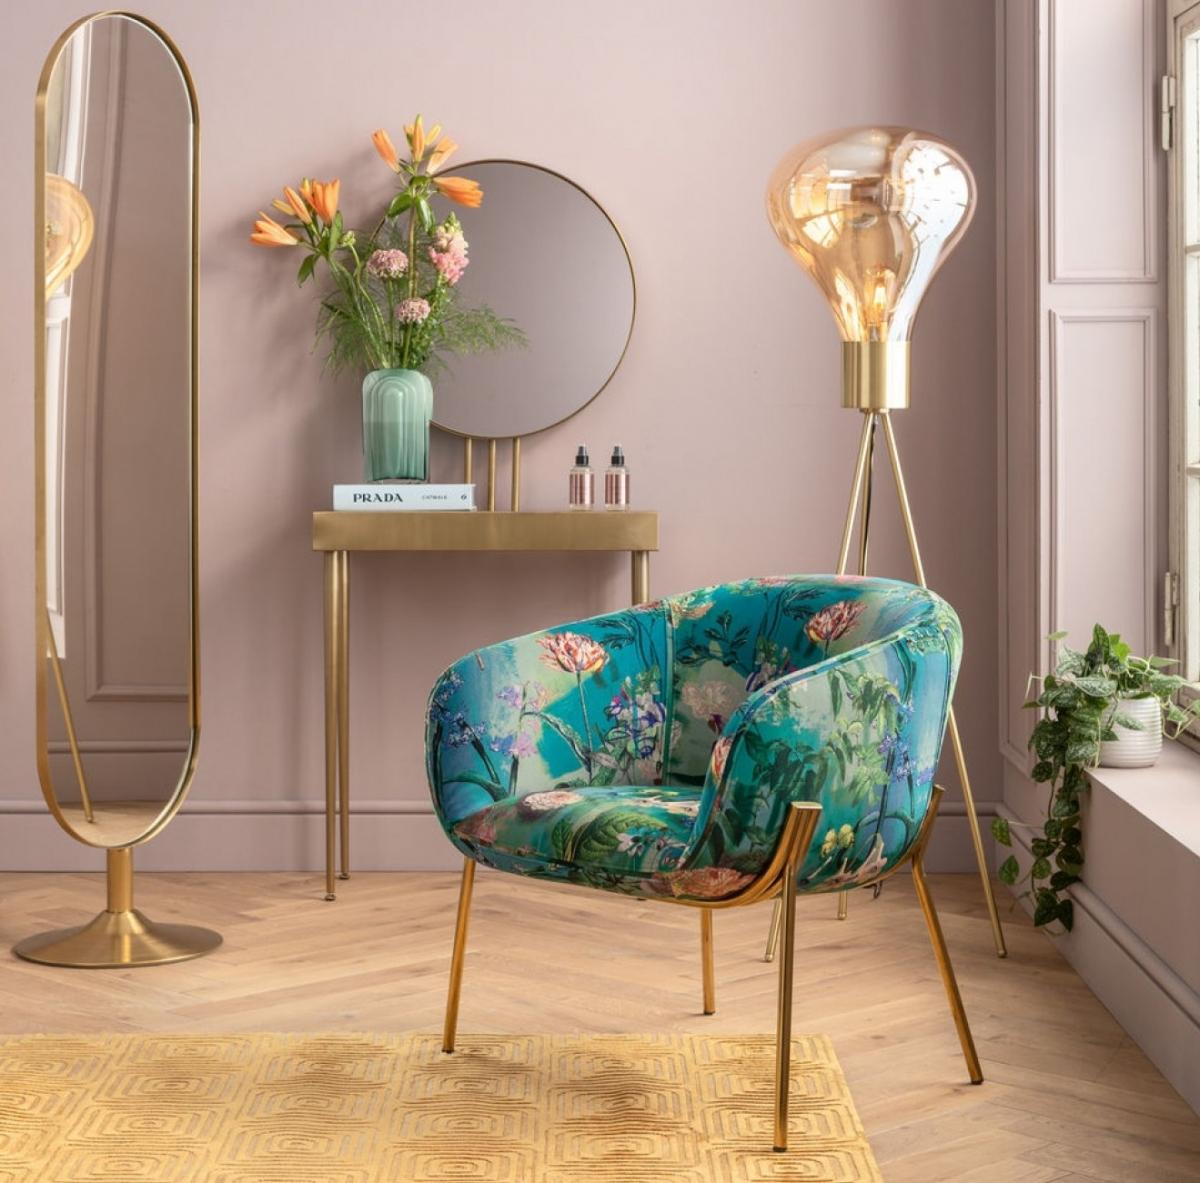 Эстетика и гламурное золото в дамской комнате